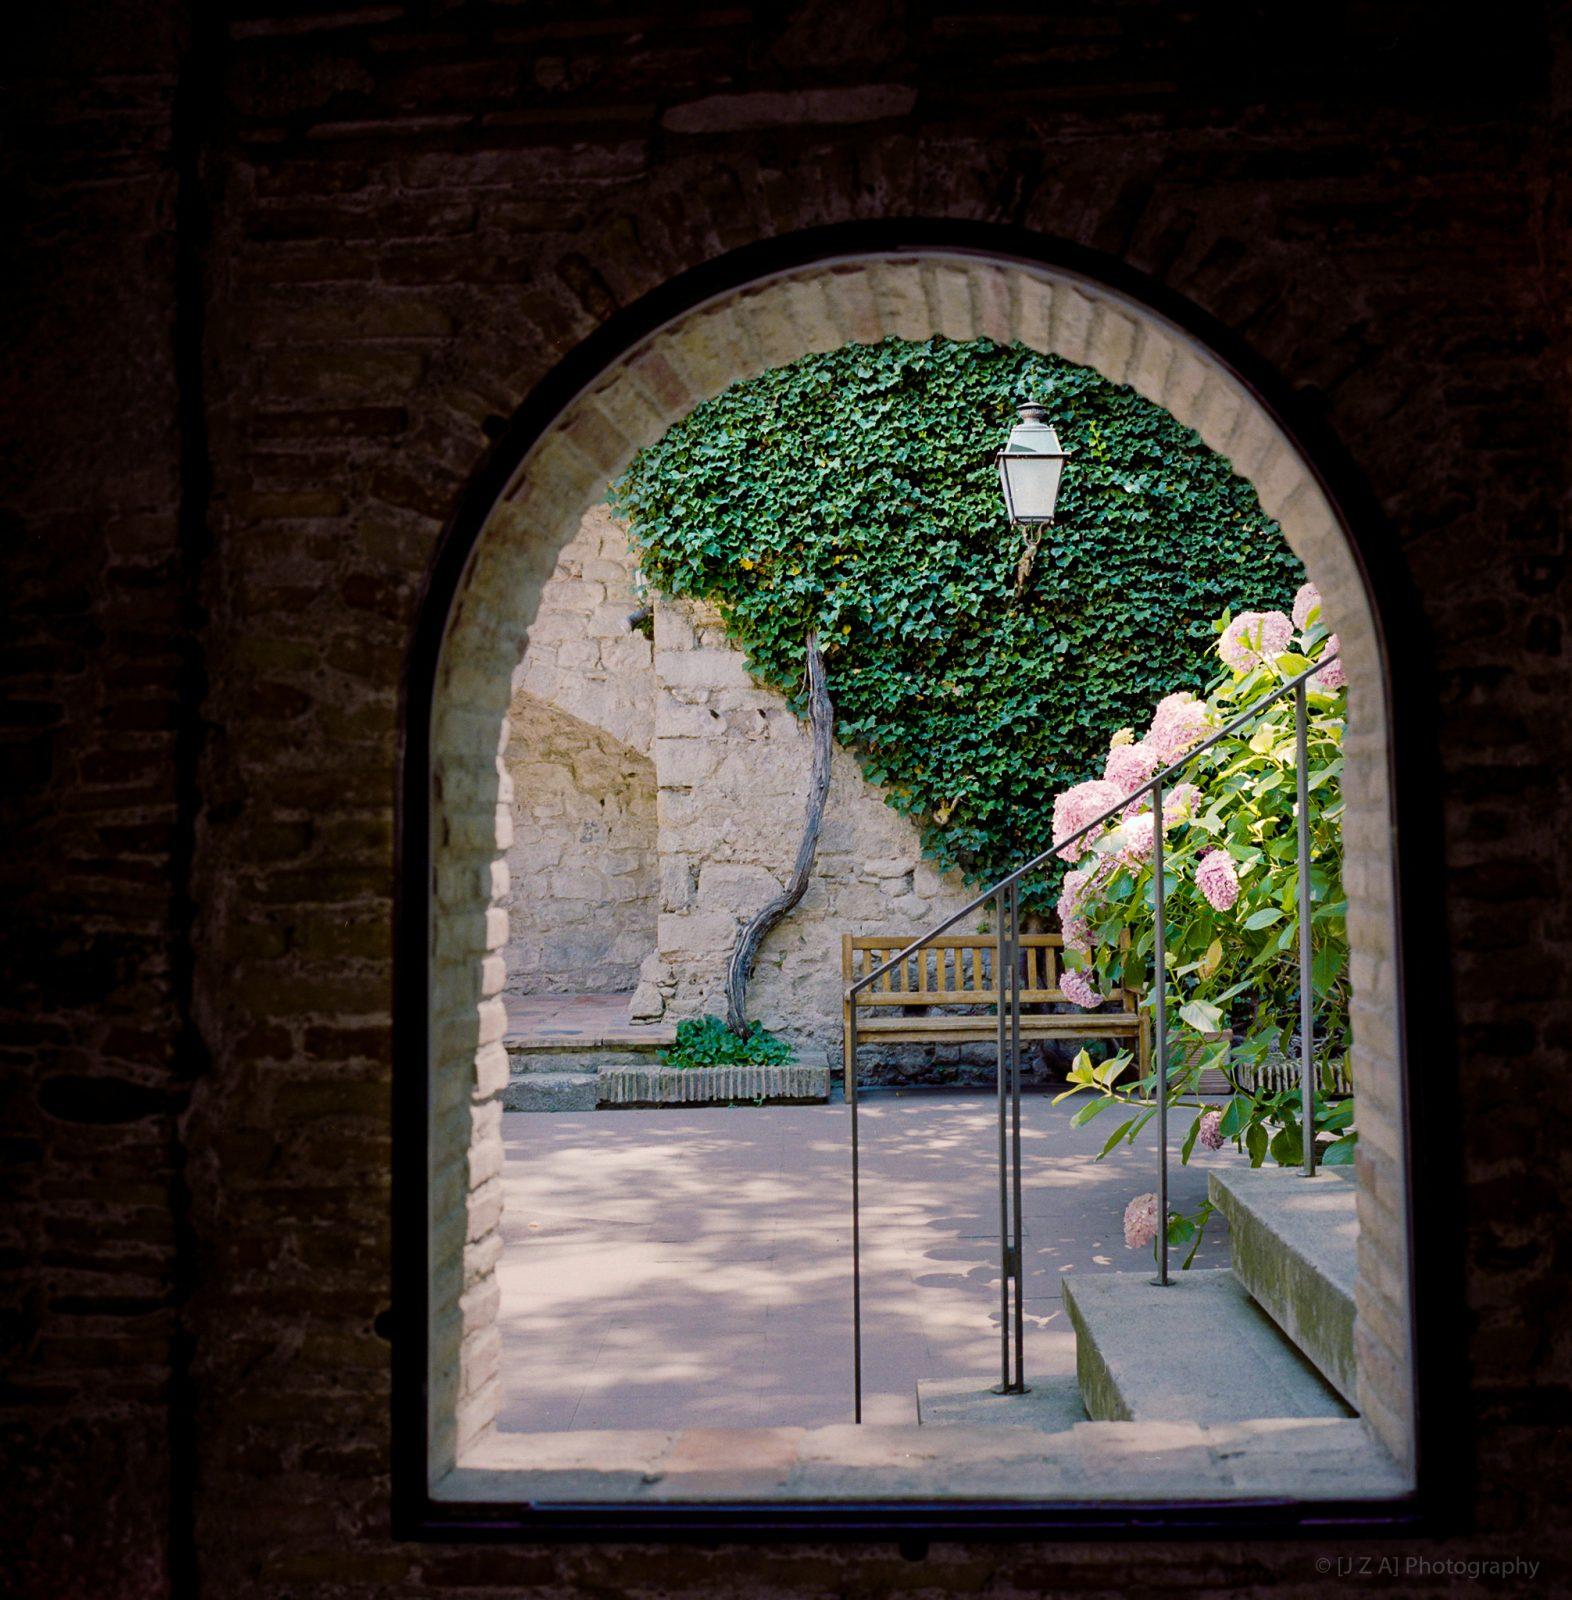 Glimpse of Girona